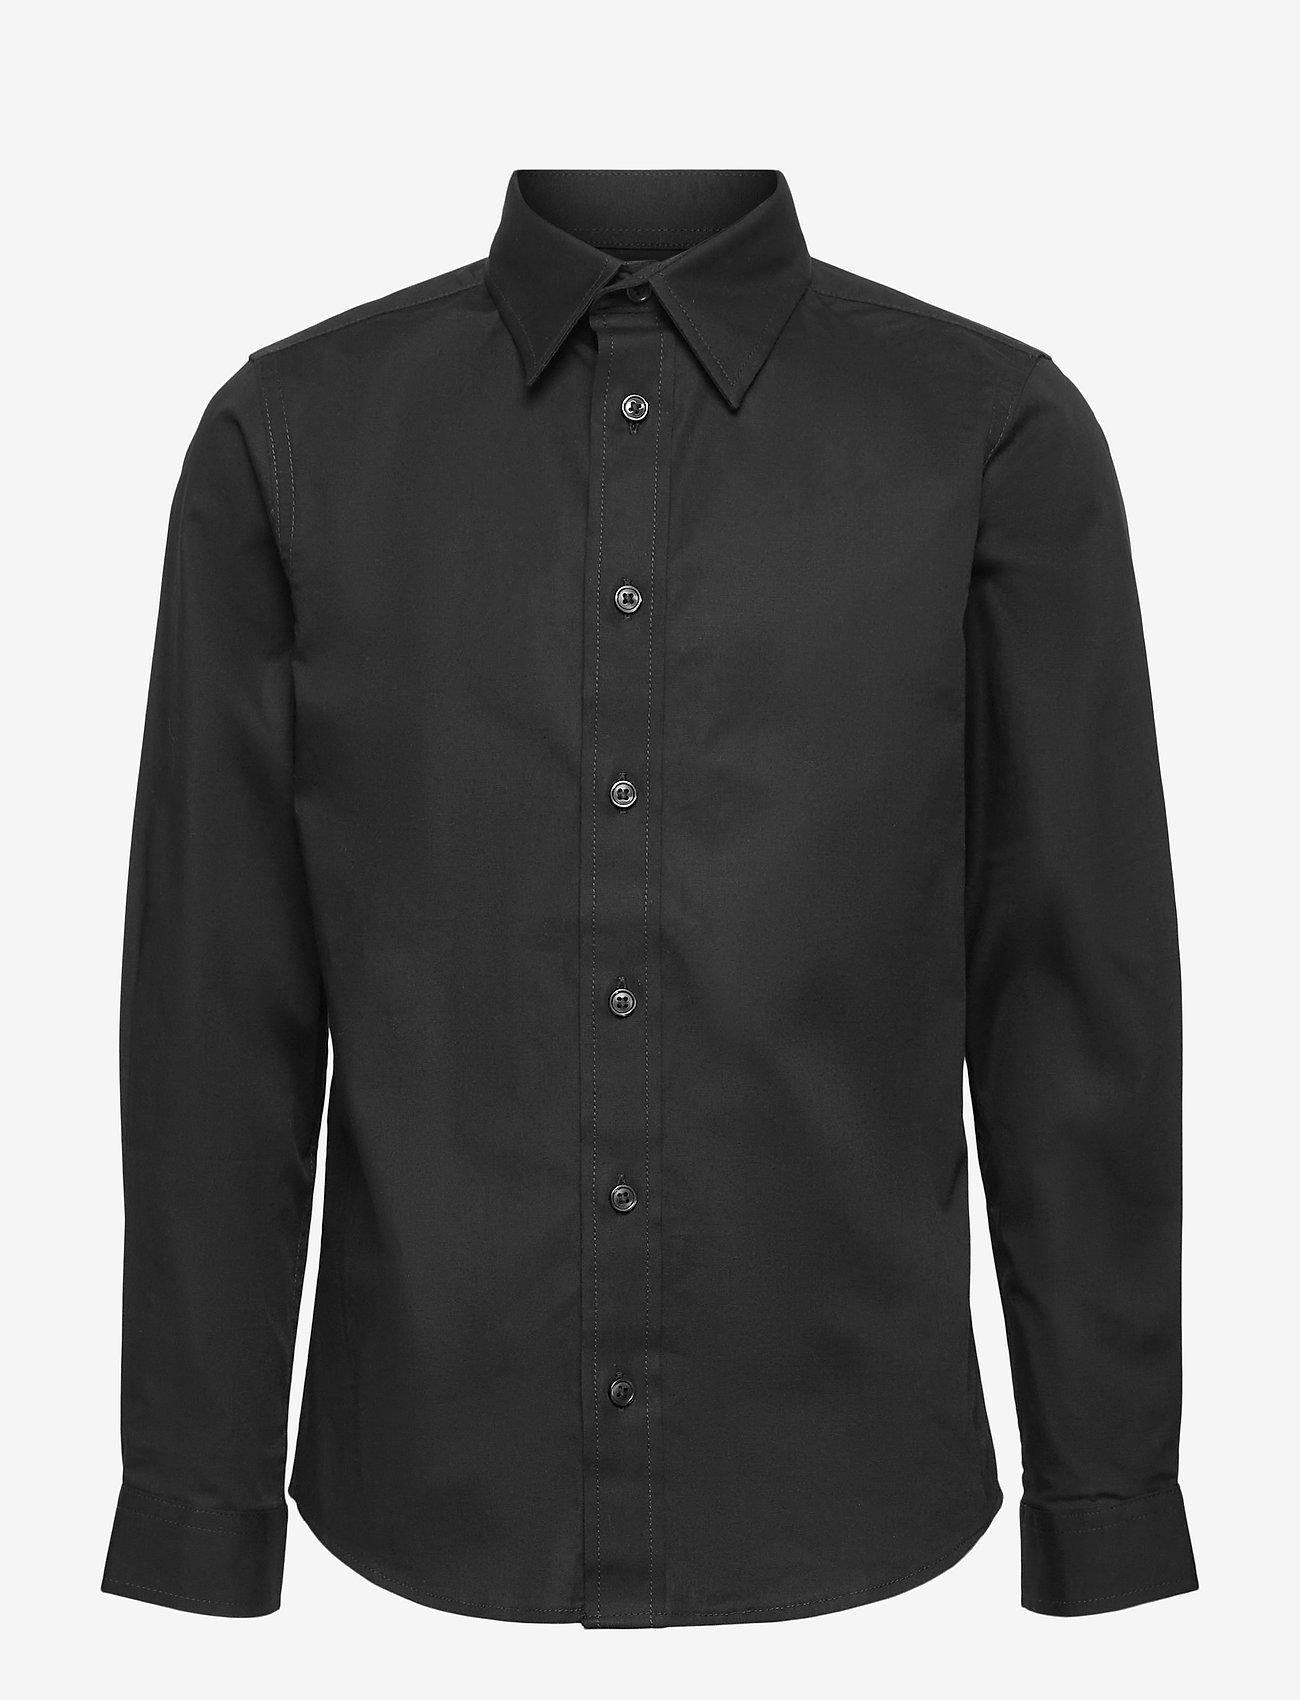 Jack & Jones - JJEMASON STRETCH SHIRT L/S ES21 JR - shirts - black - 0